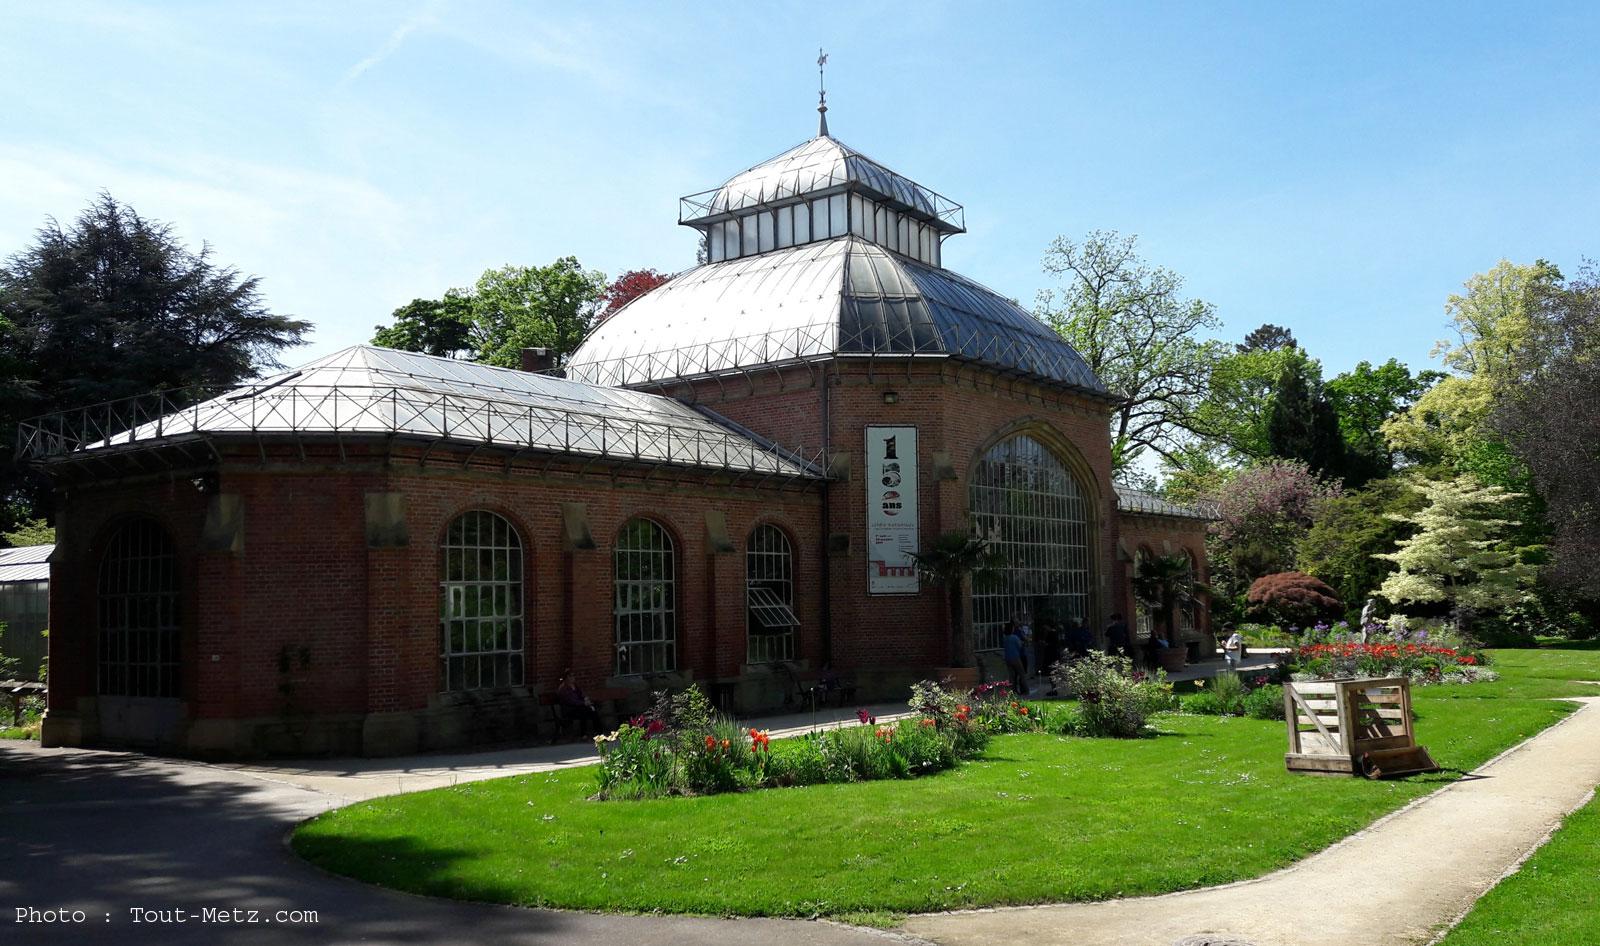 histoire jardin botanique de metz - Jardin Botanique Metz